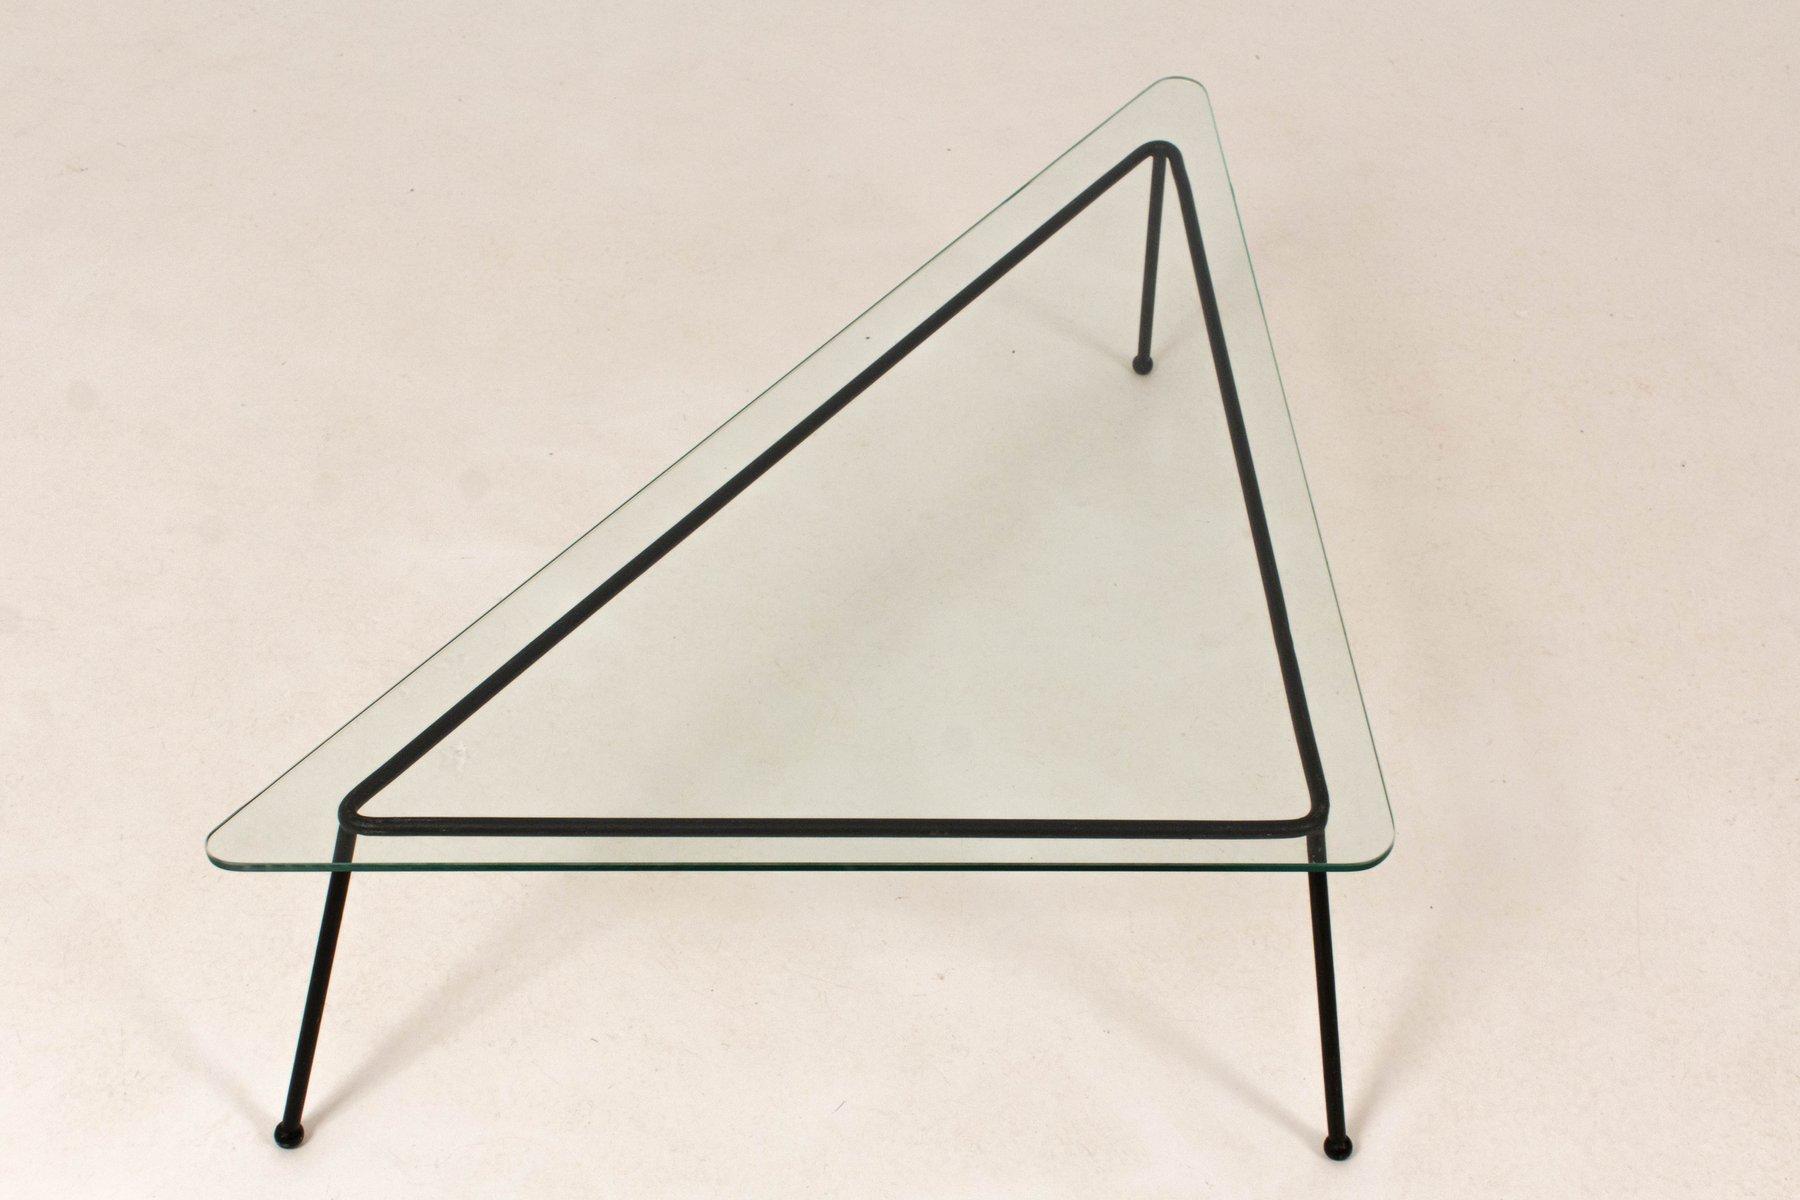 Mid century modern triangular coffee table 1960s for sale at pamono mid century modern triangular coffee table 1960s geotapseo Choice Image